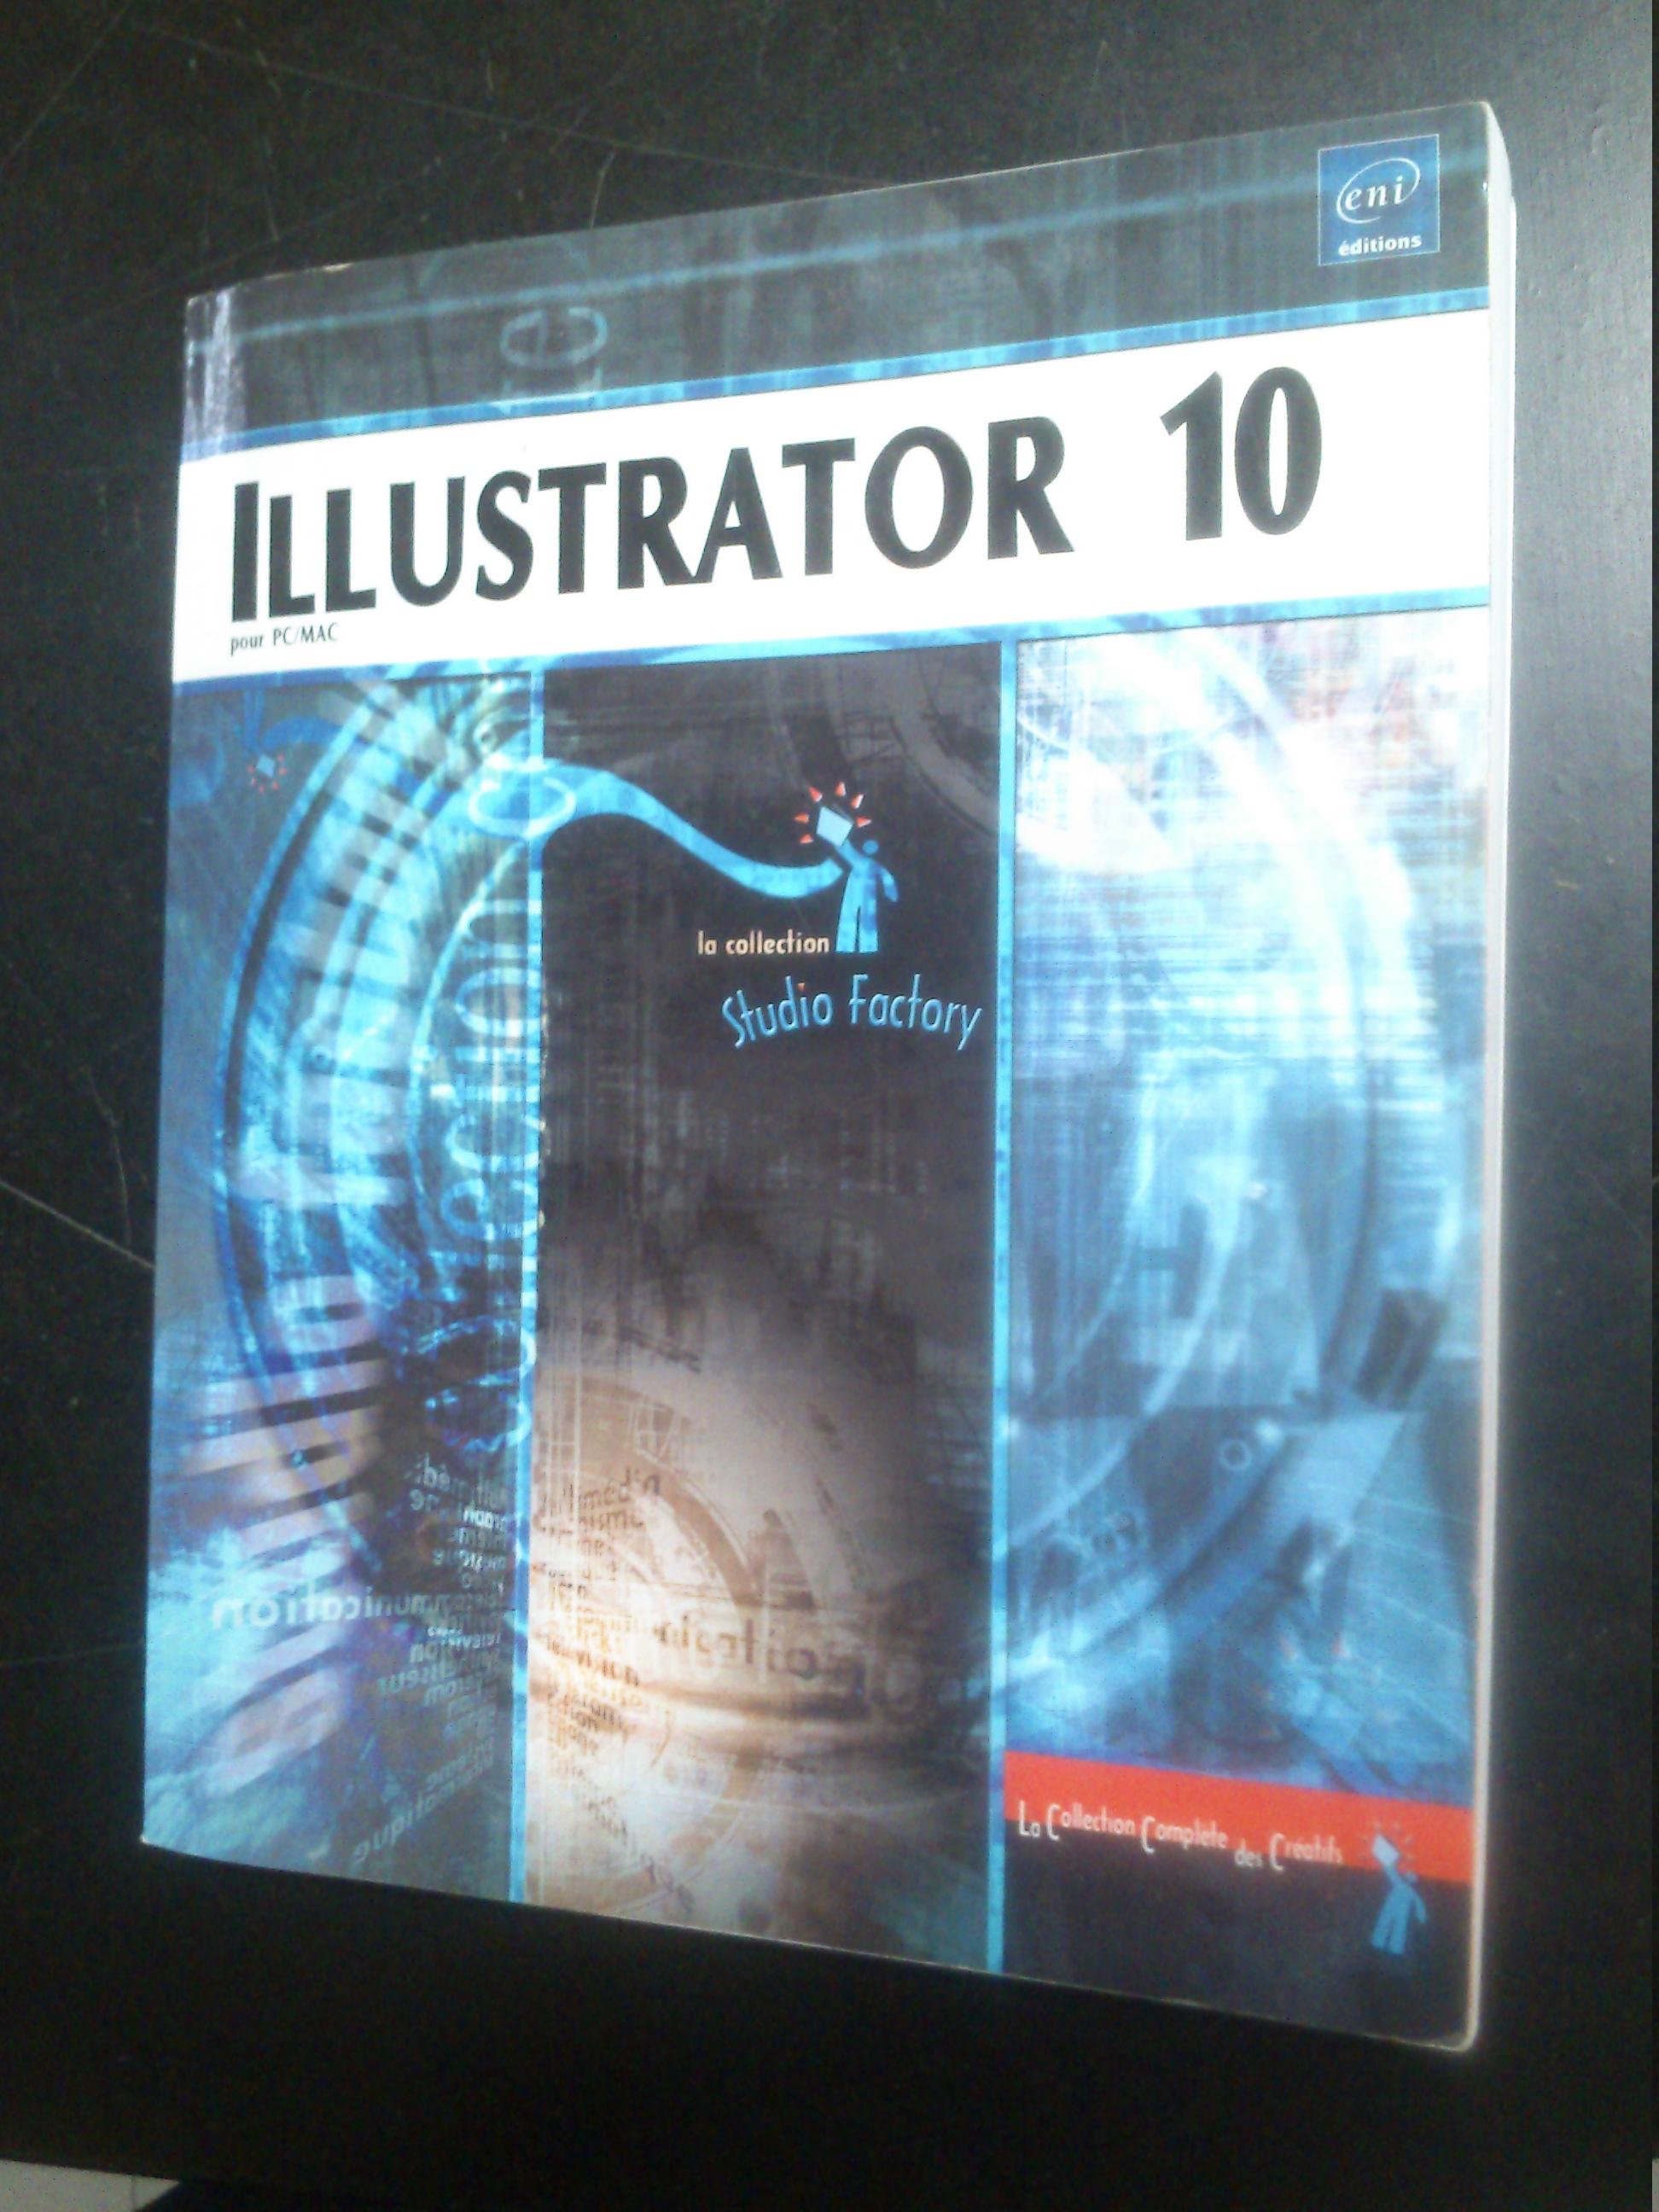 other/photos bibliothèque cambre/covers/DSC_0444.jpg